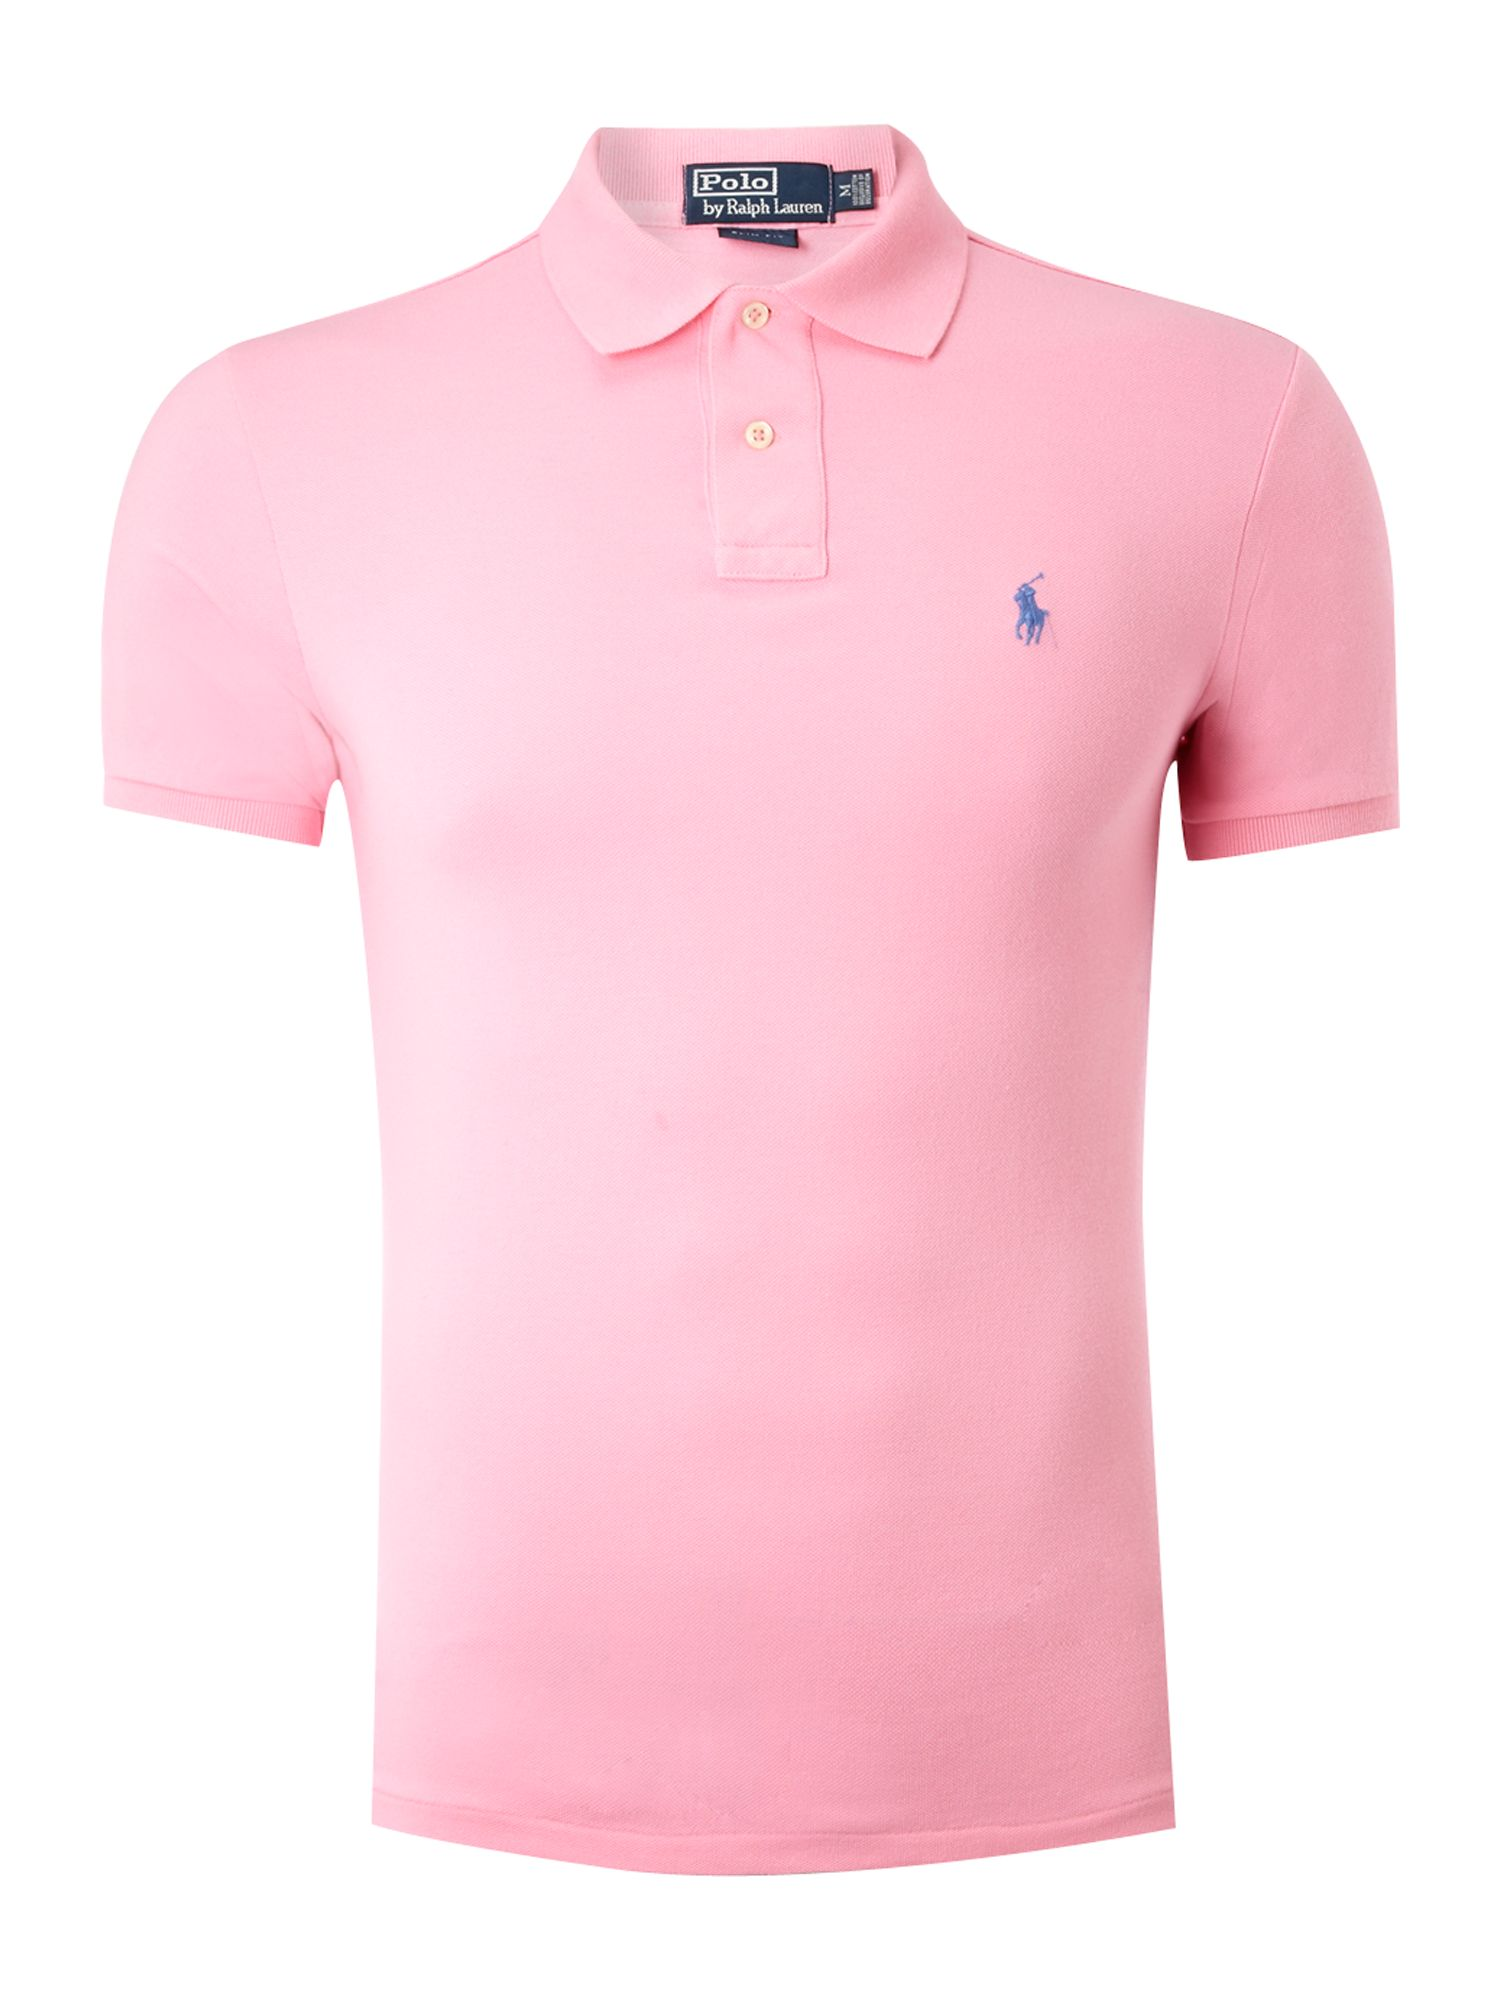 Lacoste Polo Shirt For Women